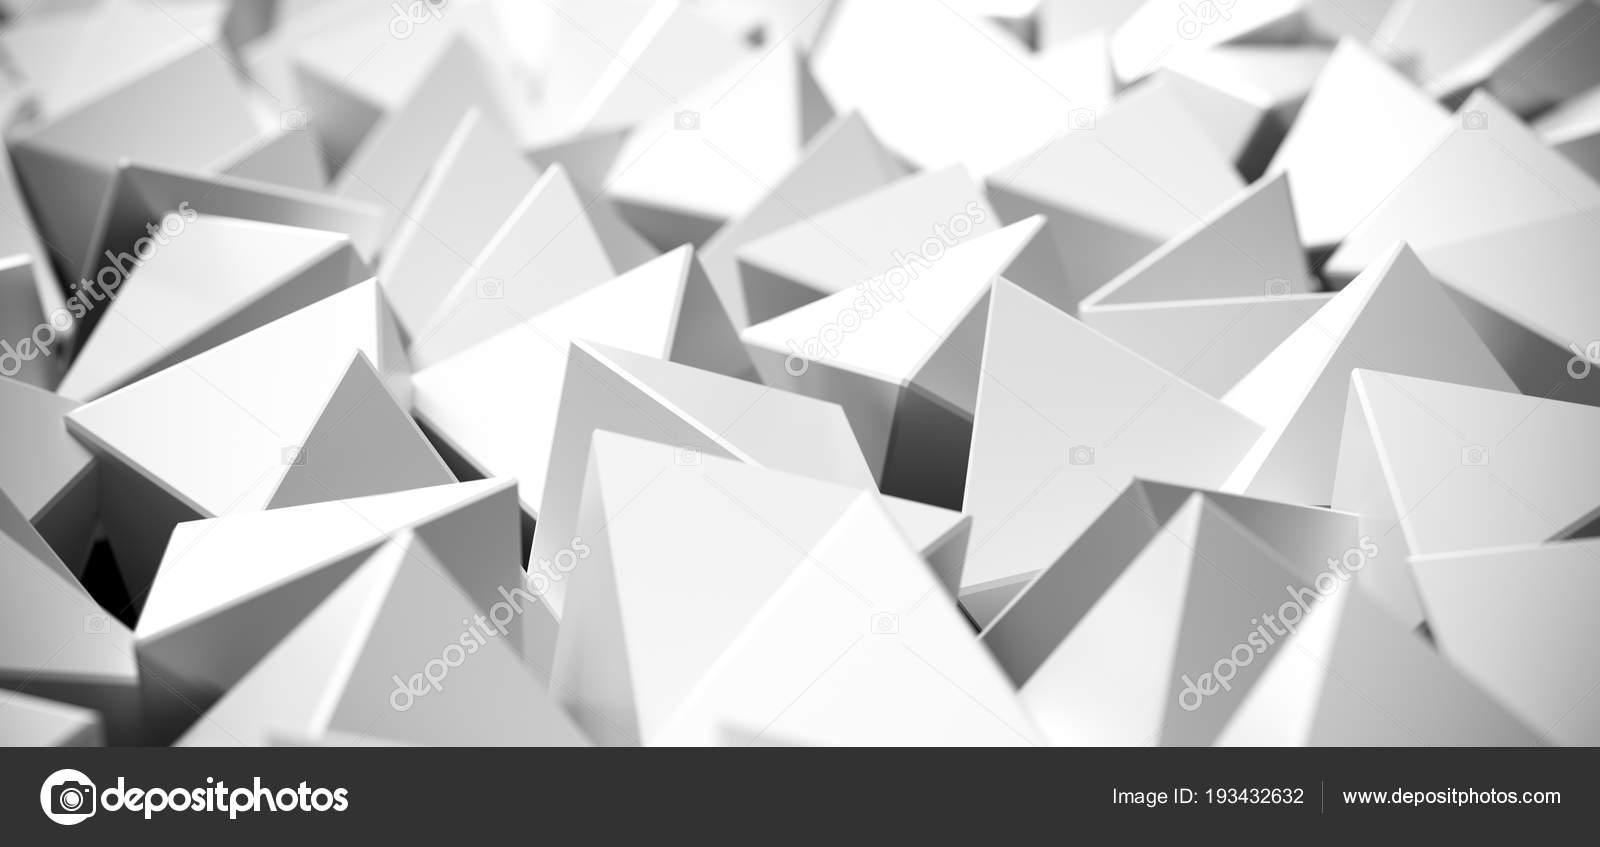 03725c8b1a2 Fondo abstracto de pirámides — Foto de stock © ivanmollovPhoto ...